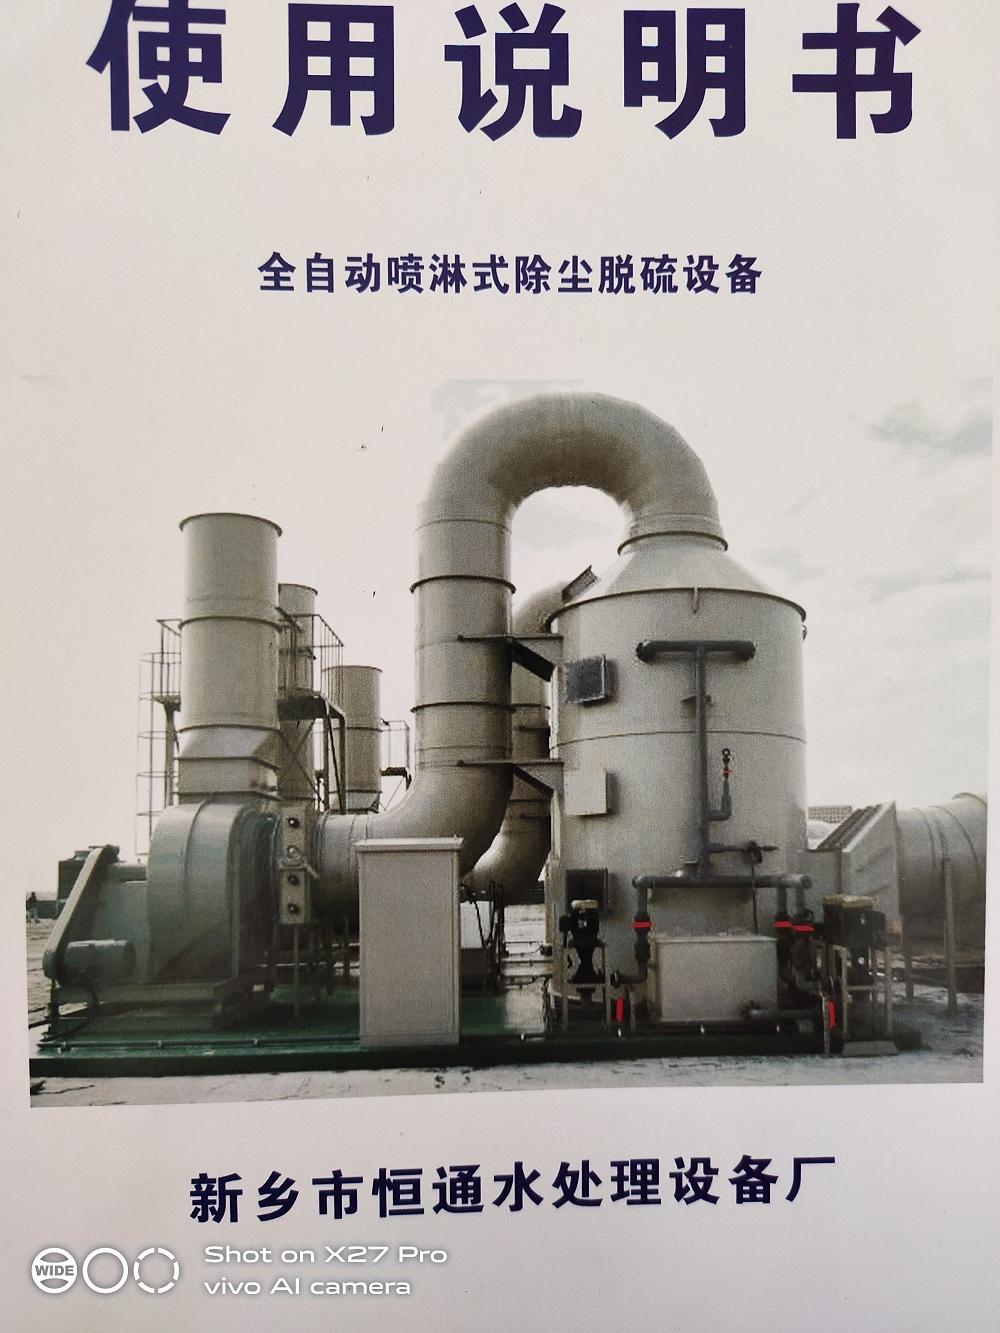 HTPC系列喷淋脱硫设备脱硫系统